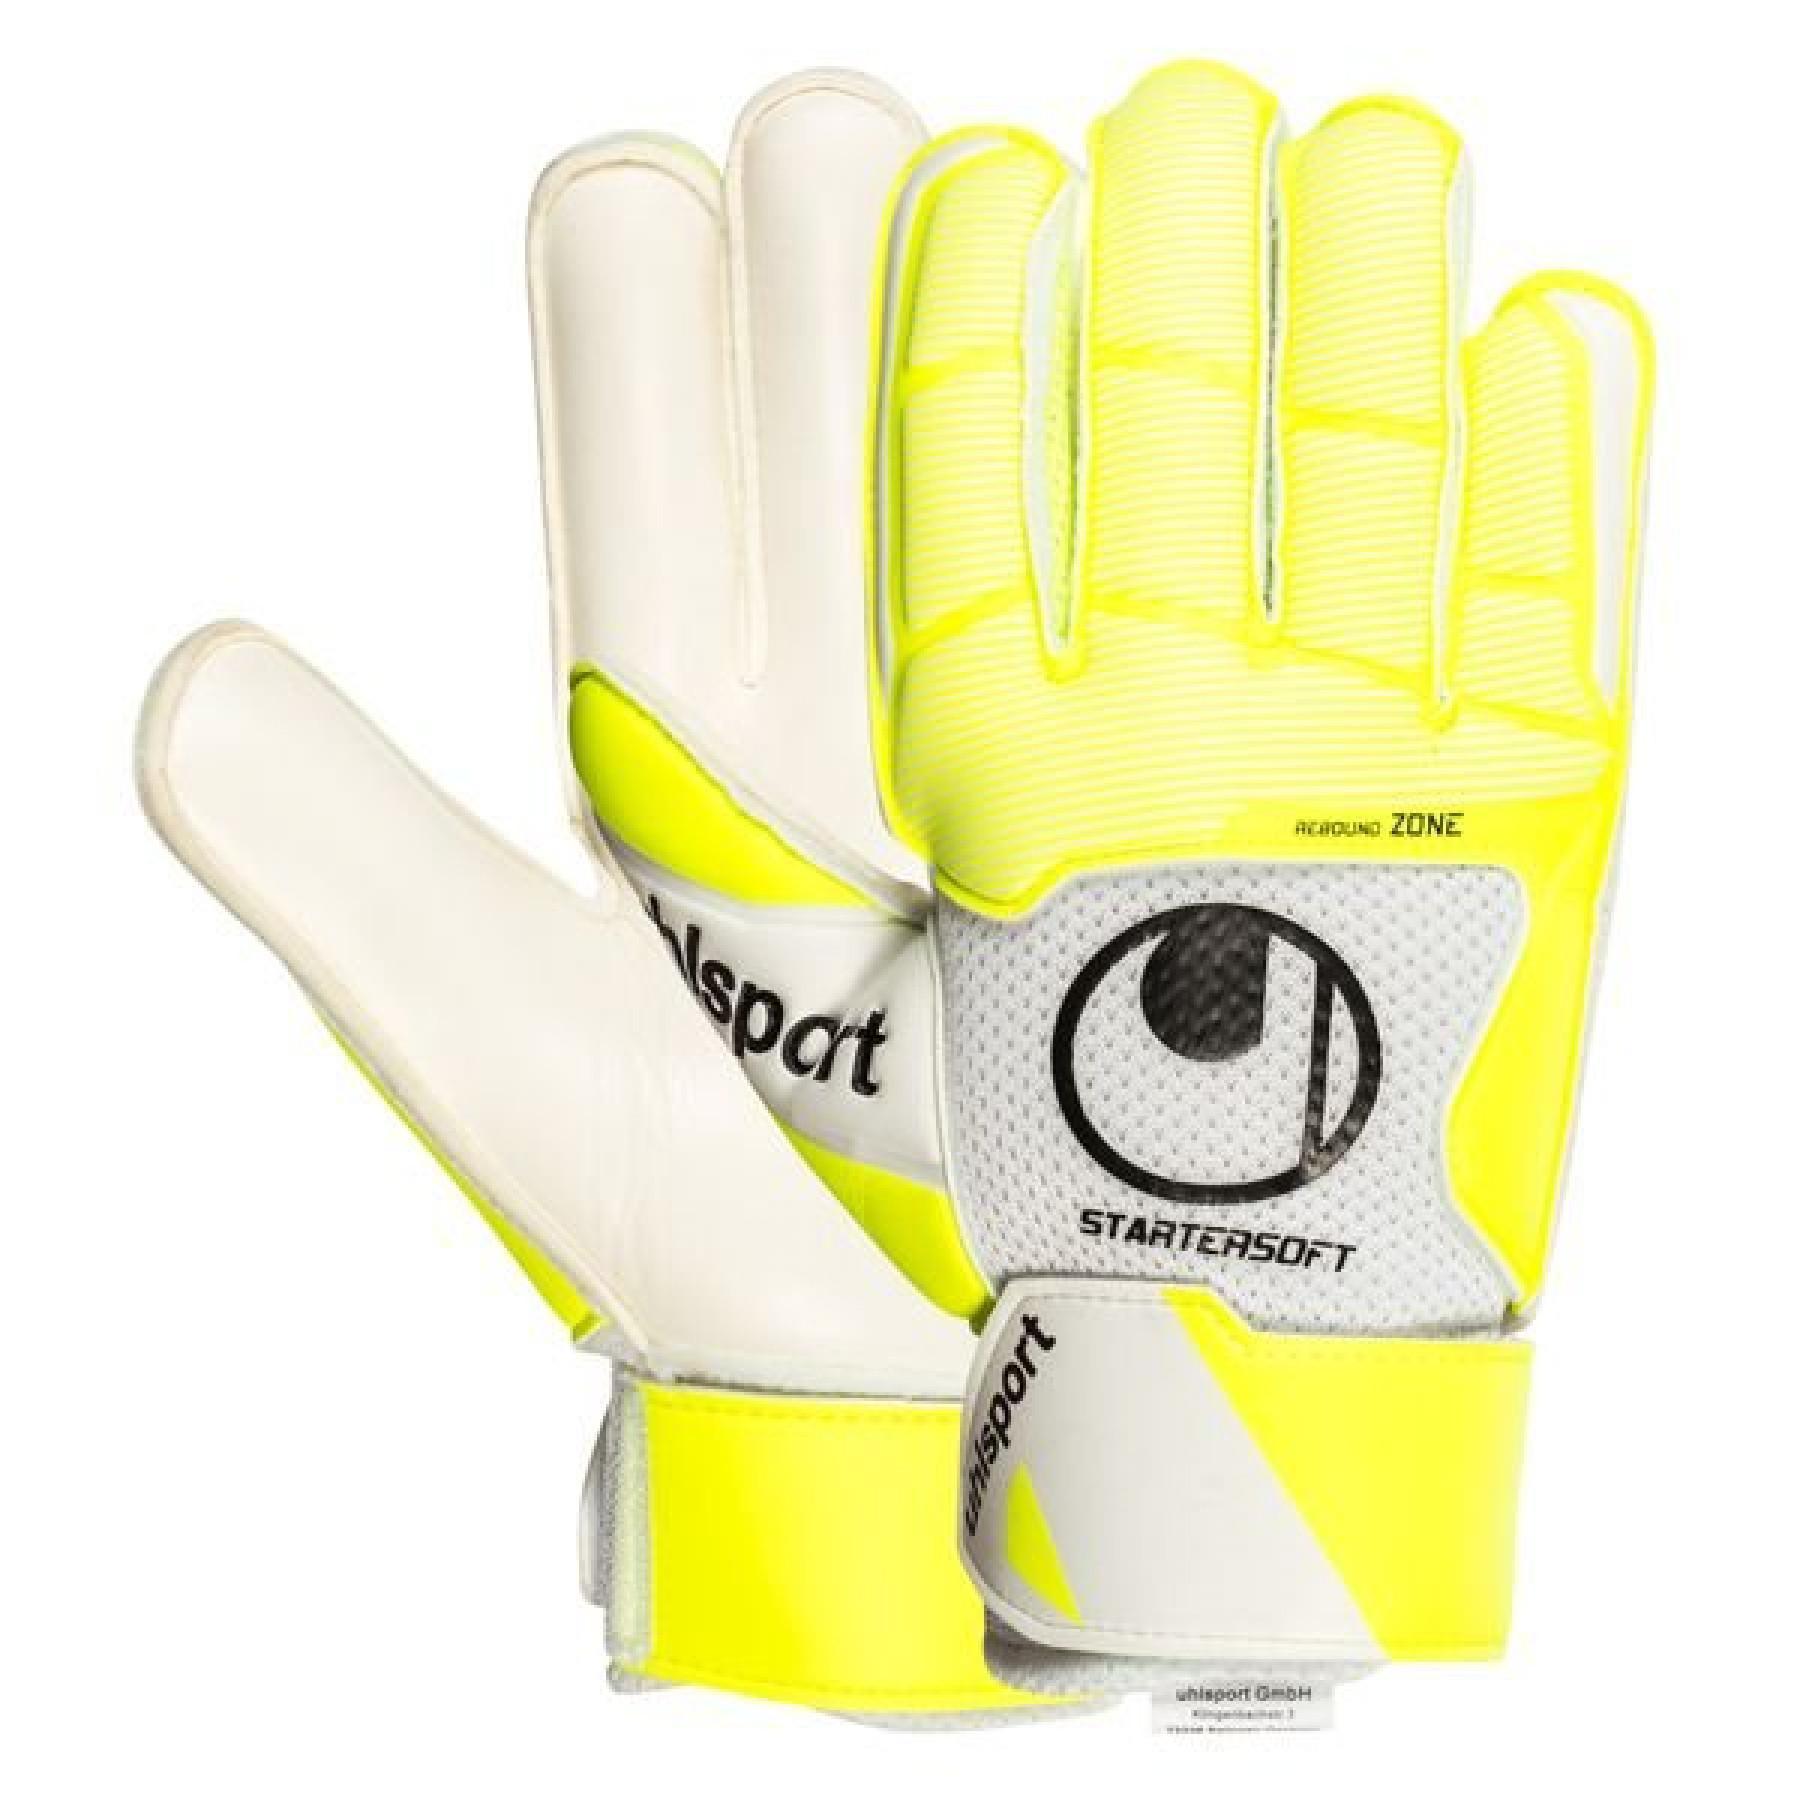 Uhlsport Pure Alliance Starter Soft Gloves